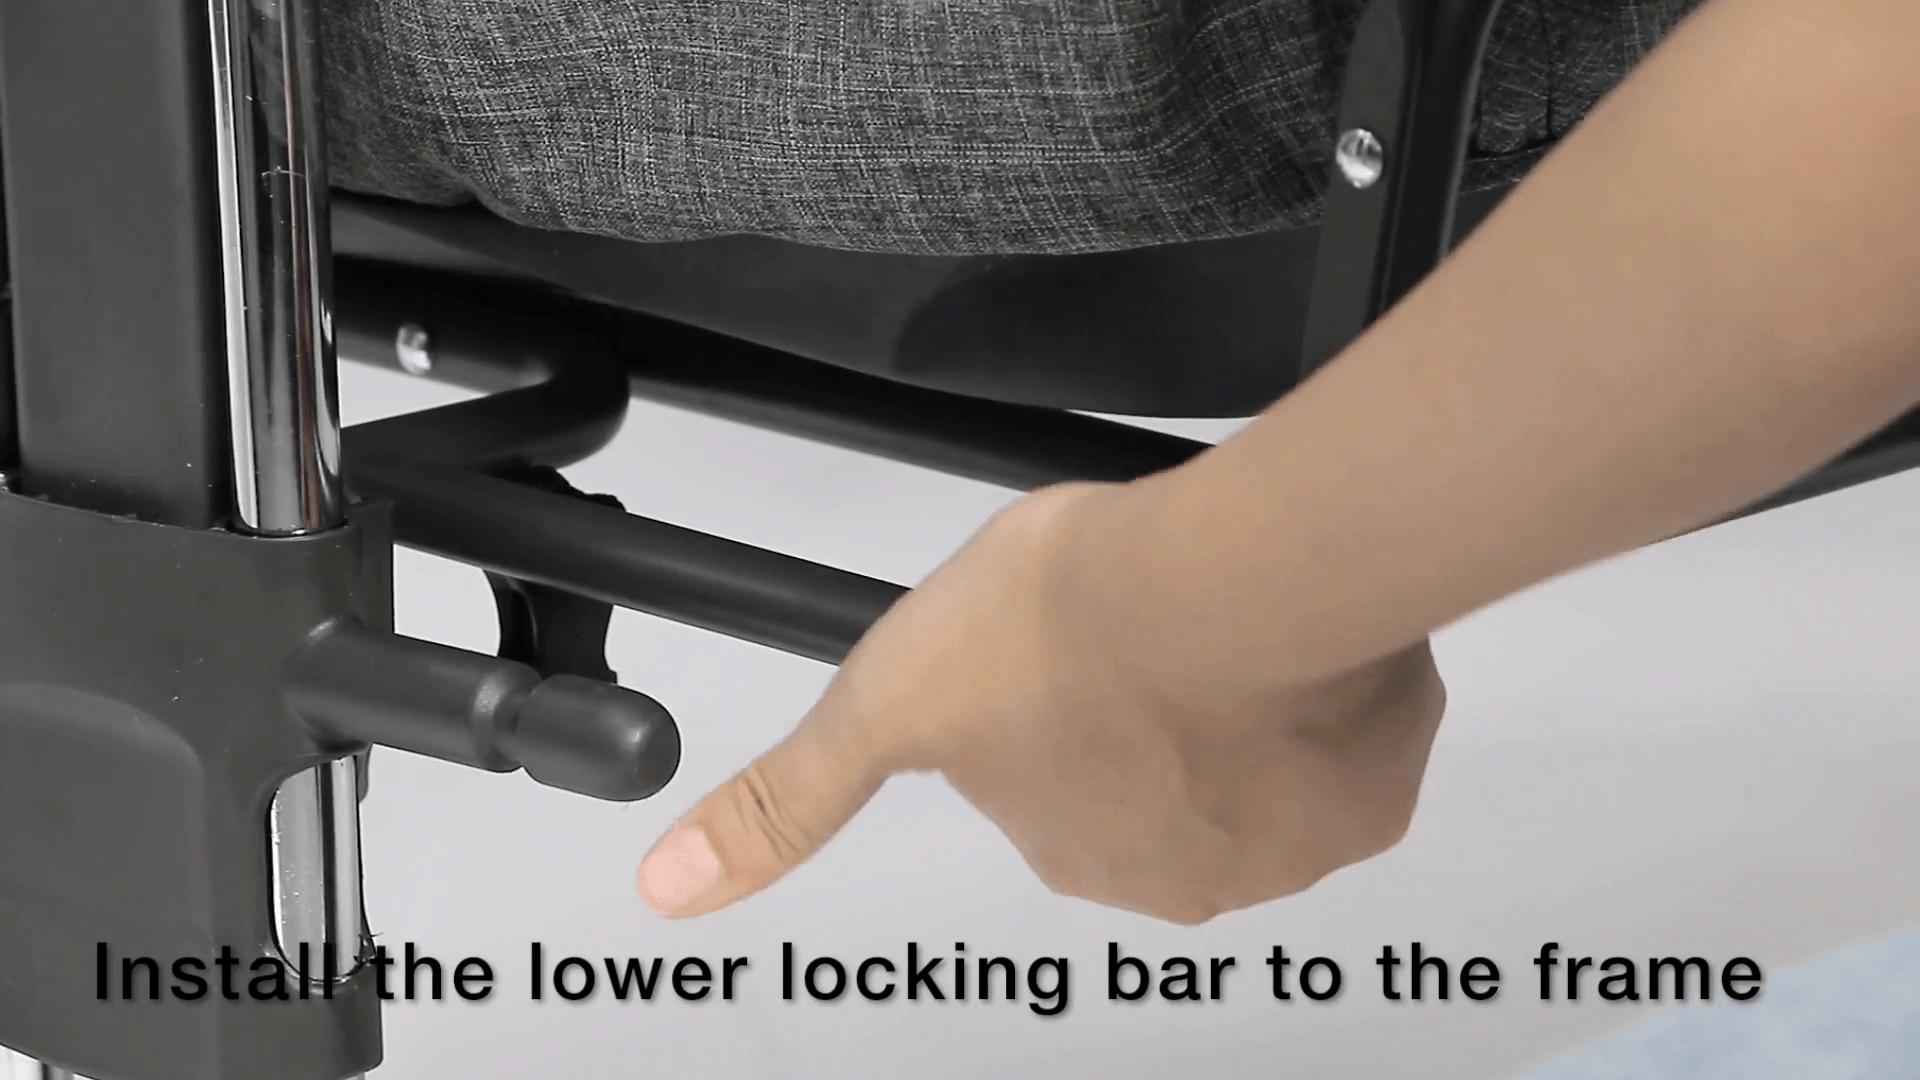 Mika Micky - install lower locking bar 2